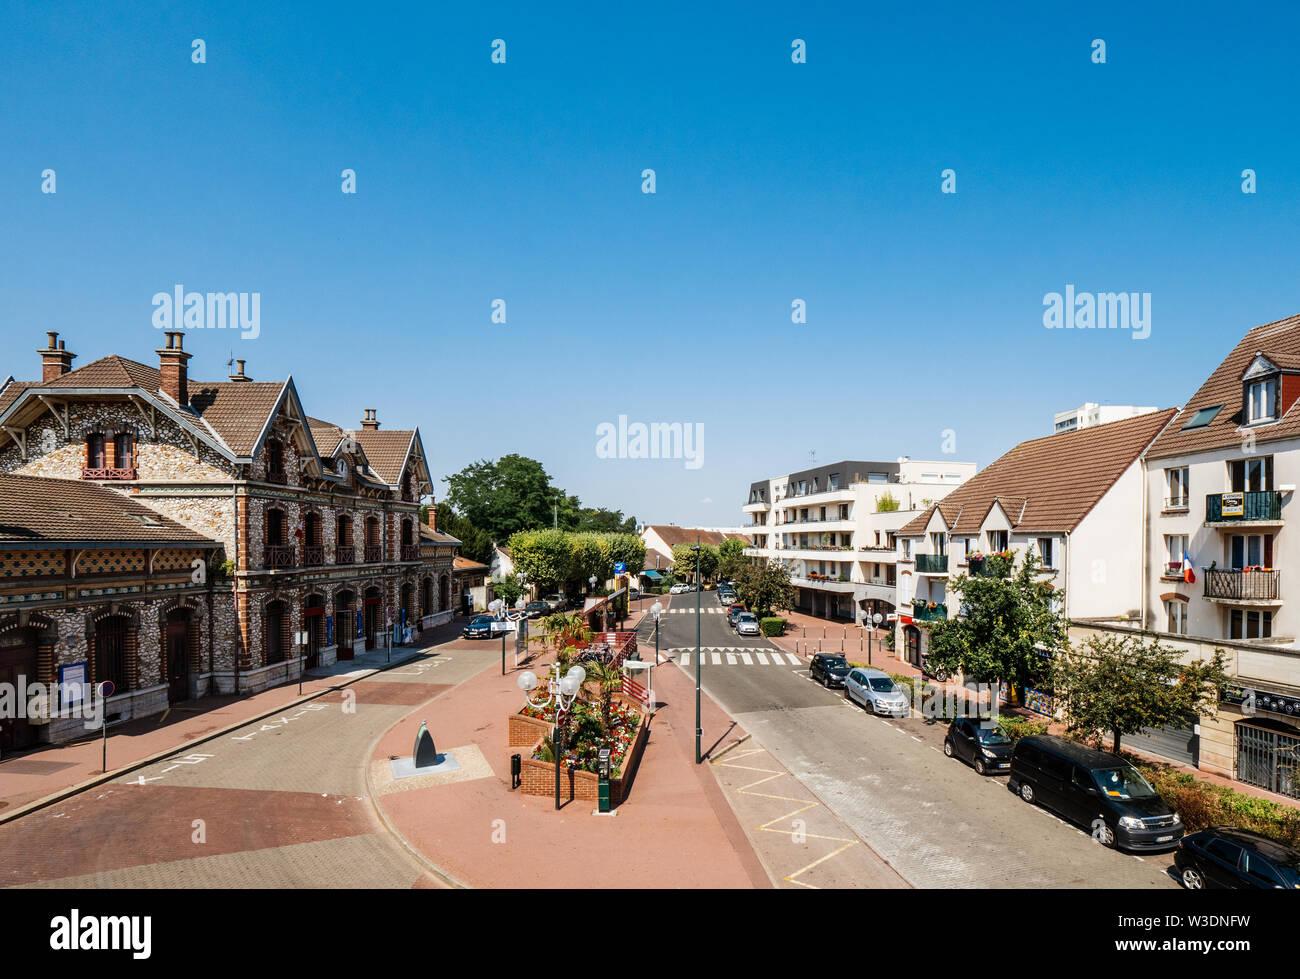 Saint-Gratien, France - Jul 15, 2018: Aerial drone view of Saint Gratien with central Train Station. Saint-Gratien is a commune in the northern suburbs of Paris - Stock Image